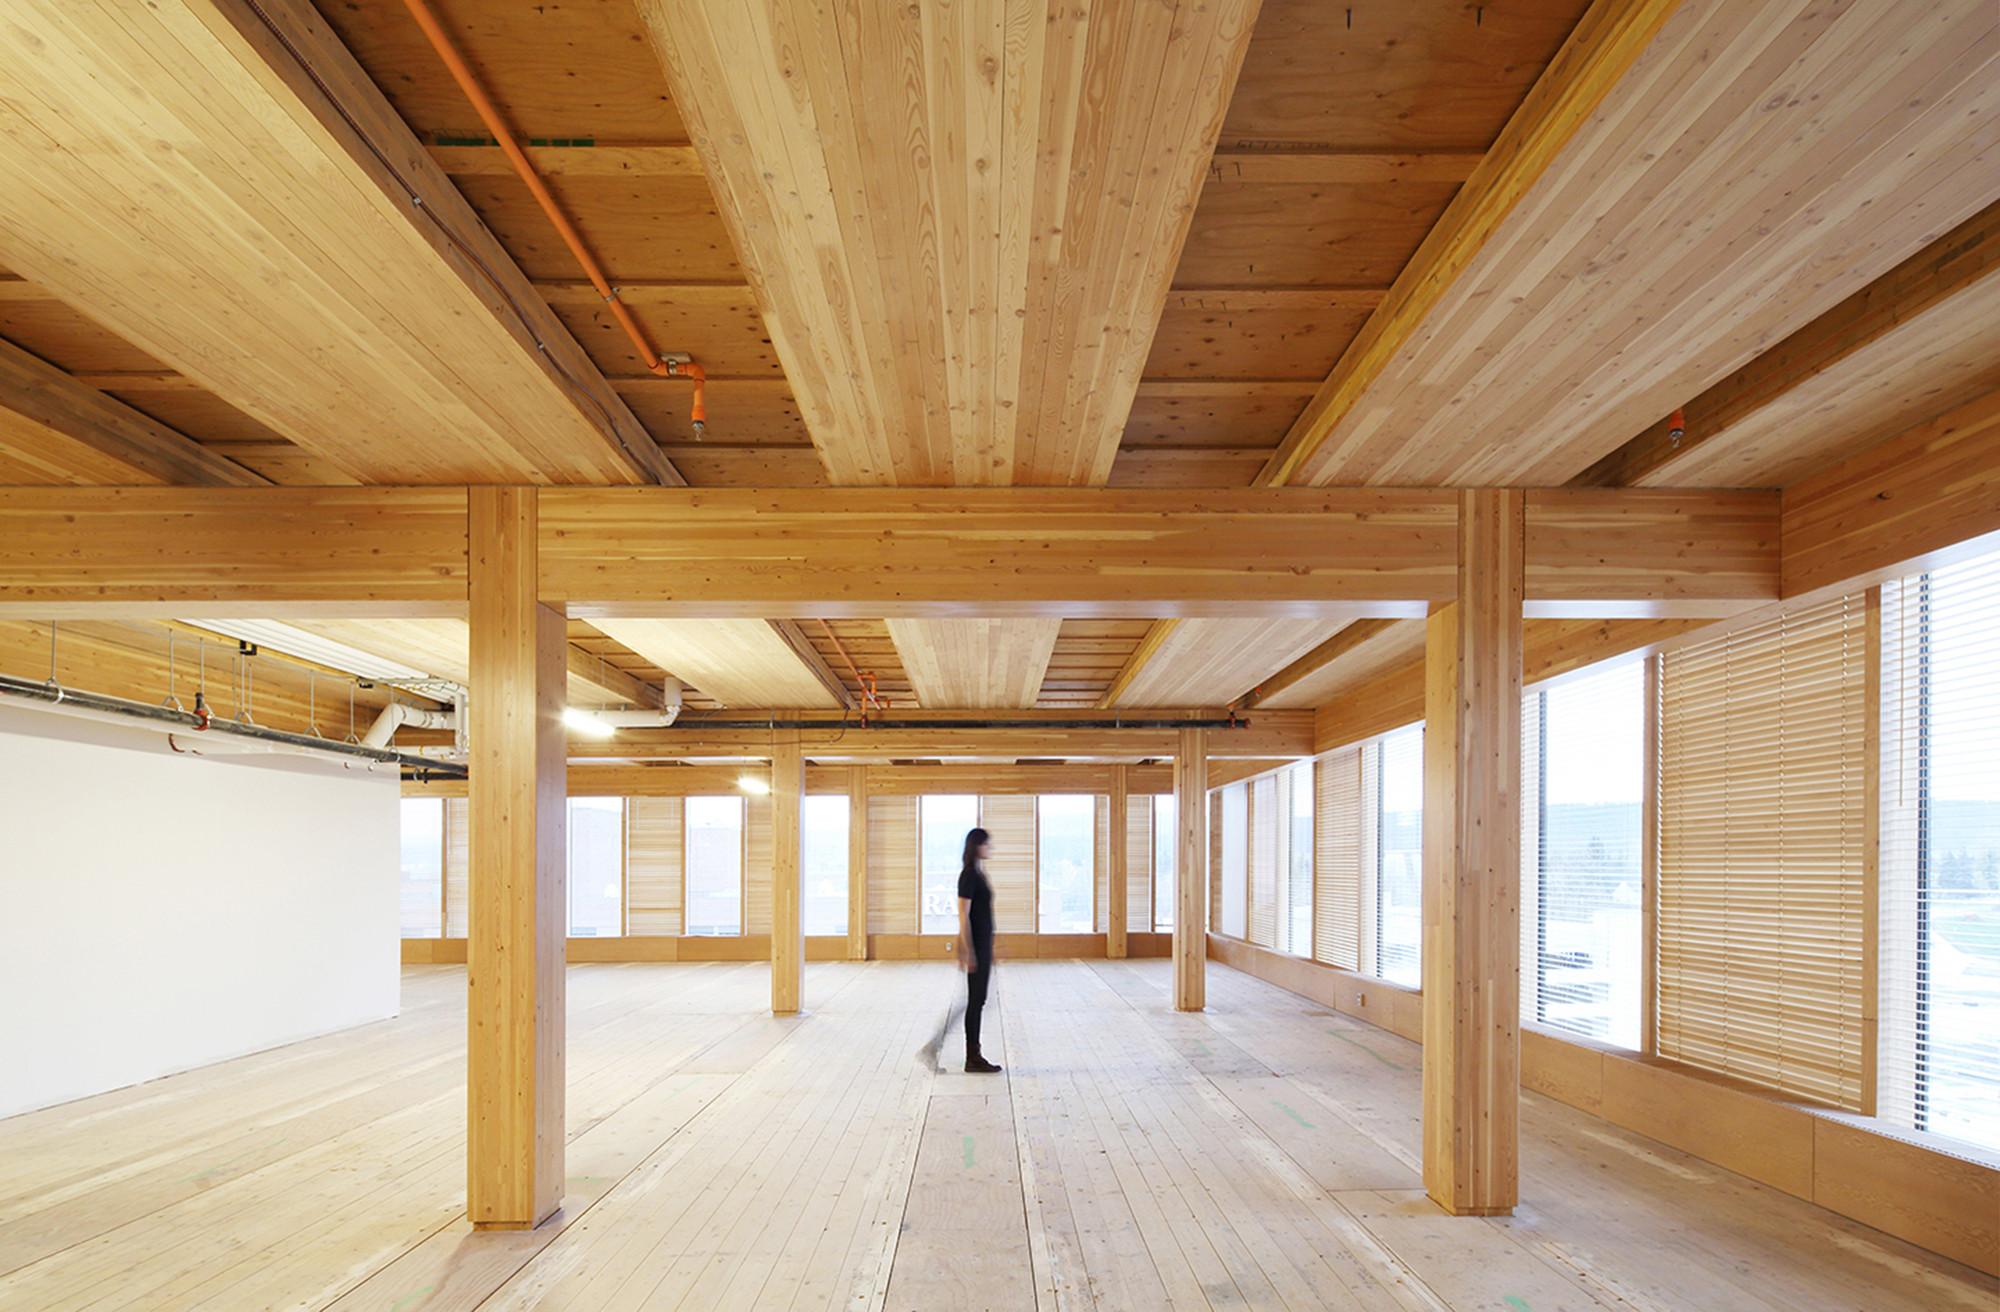 architecture aw raics innovation - HD2000×1312